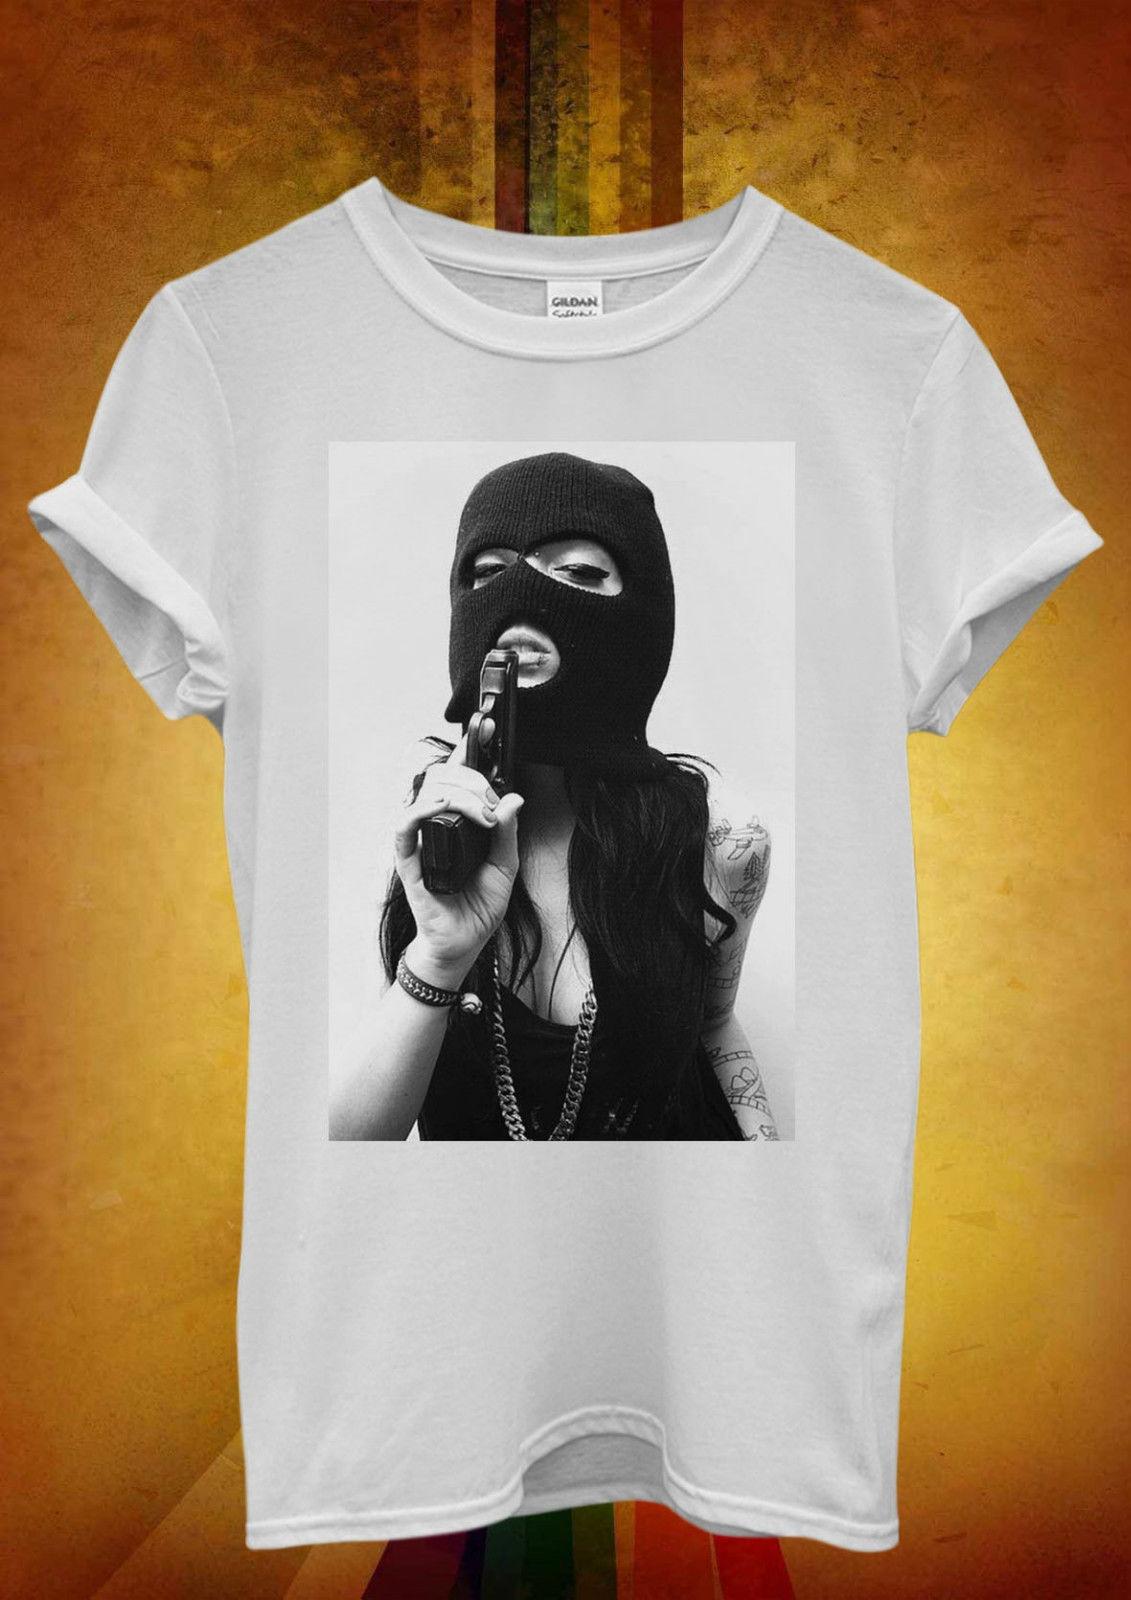 Tattoo Girl Gun Violence Funny Cool Men Women Unisex T Shirt  Top Vest 1049 New Shirts Tops Tee